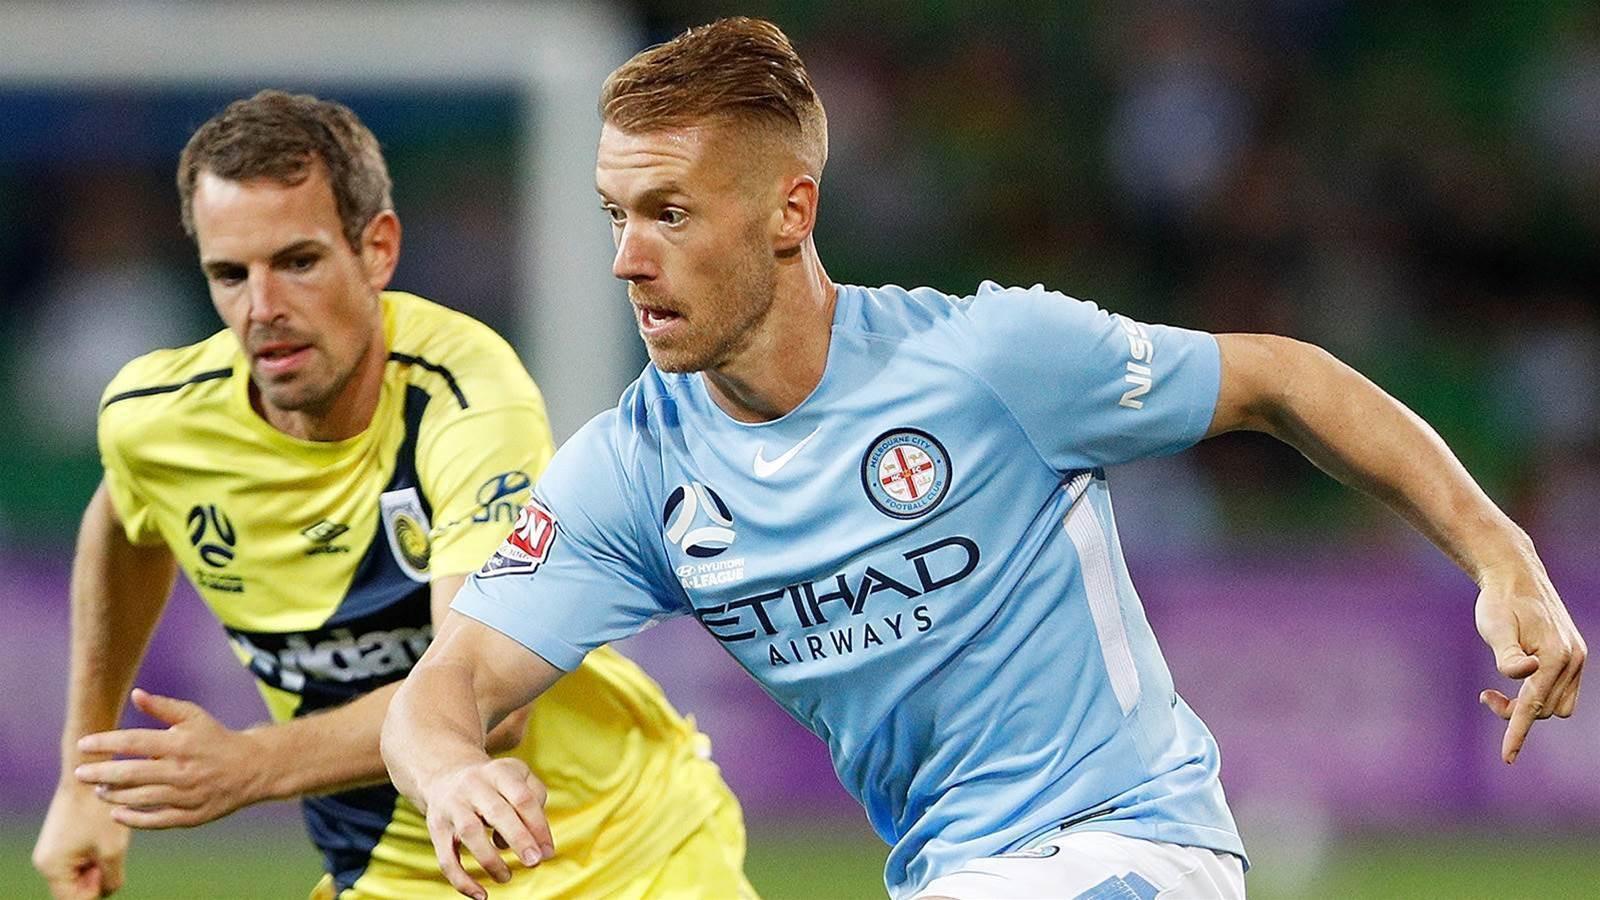 Aussies Abroad Wrap: Bozanic's rollercoaster week